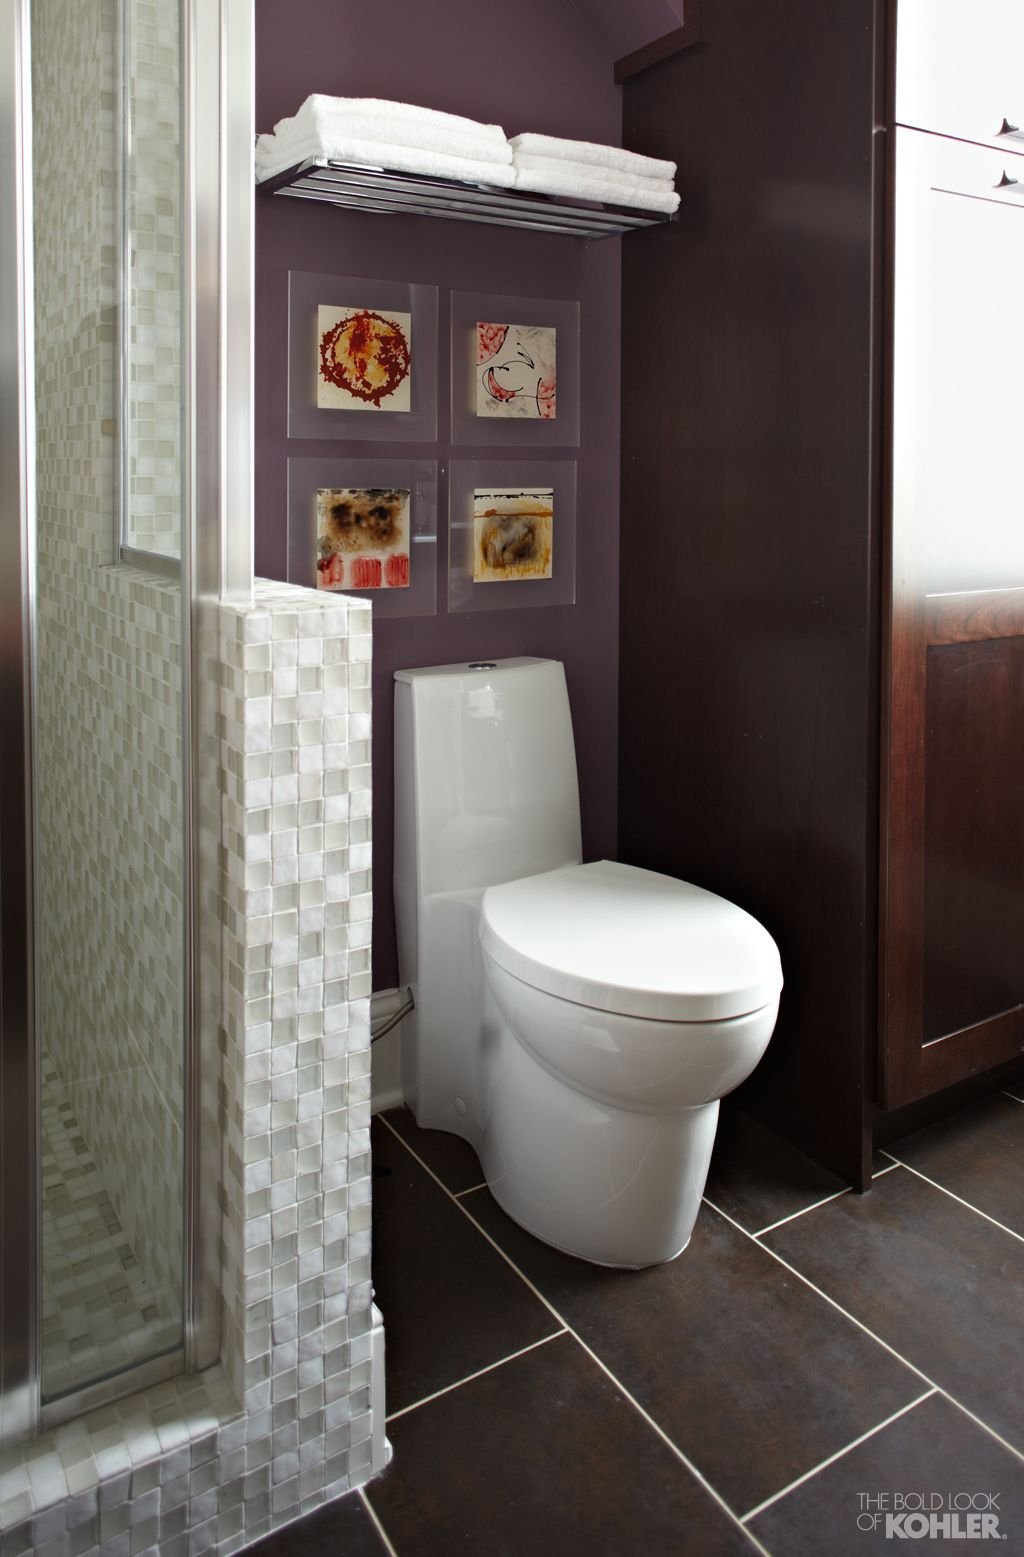 the bold look of bathrooms bathroom kohler toilet home goods decor. Black Bedroom Furniture Sets. Home Design Ideas